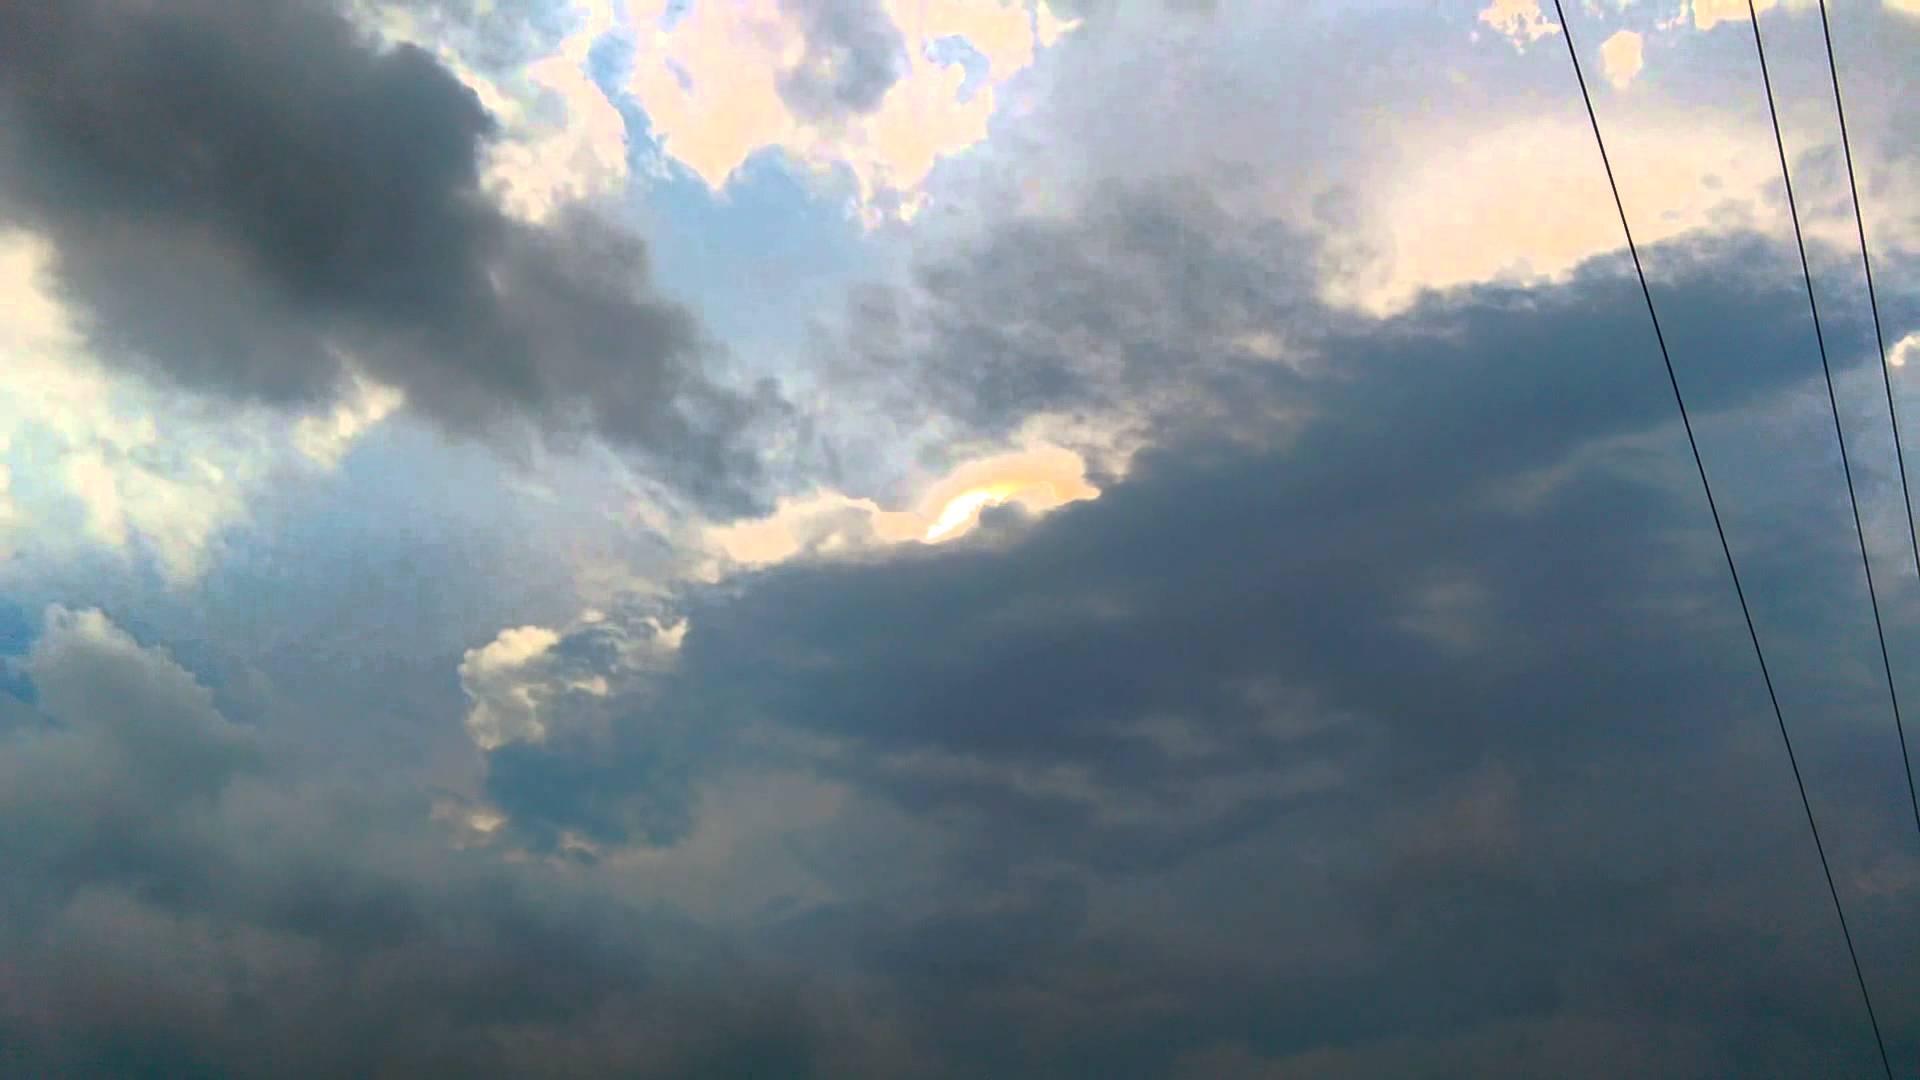 strange light clouds Greenwood Indiana, strange light clouds Greenwood Indiana video, video of strange light clouds Greenwood Indiana, crown flash, crown flash video, leaping sun dog, leaping sun dog video